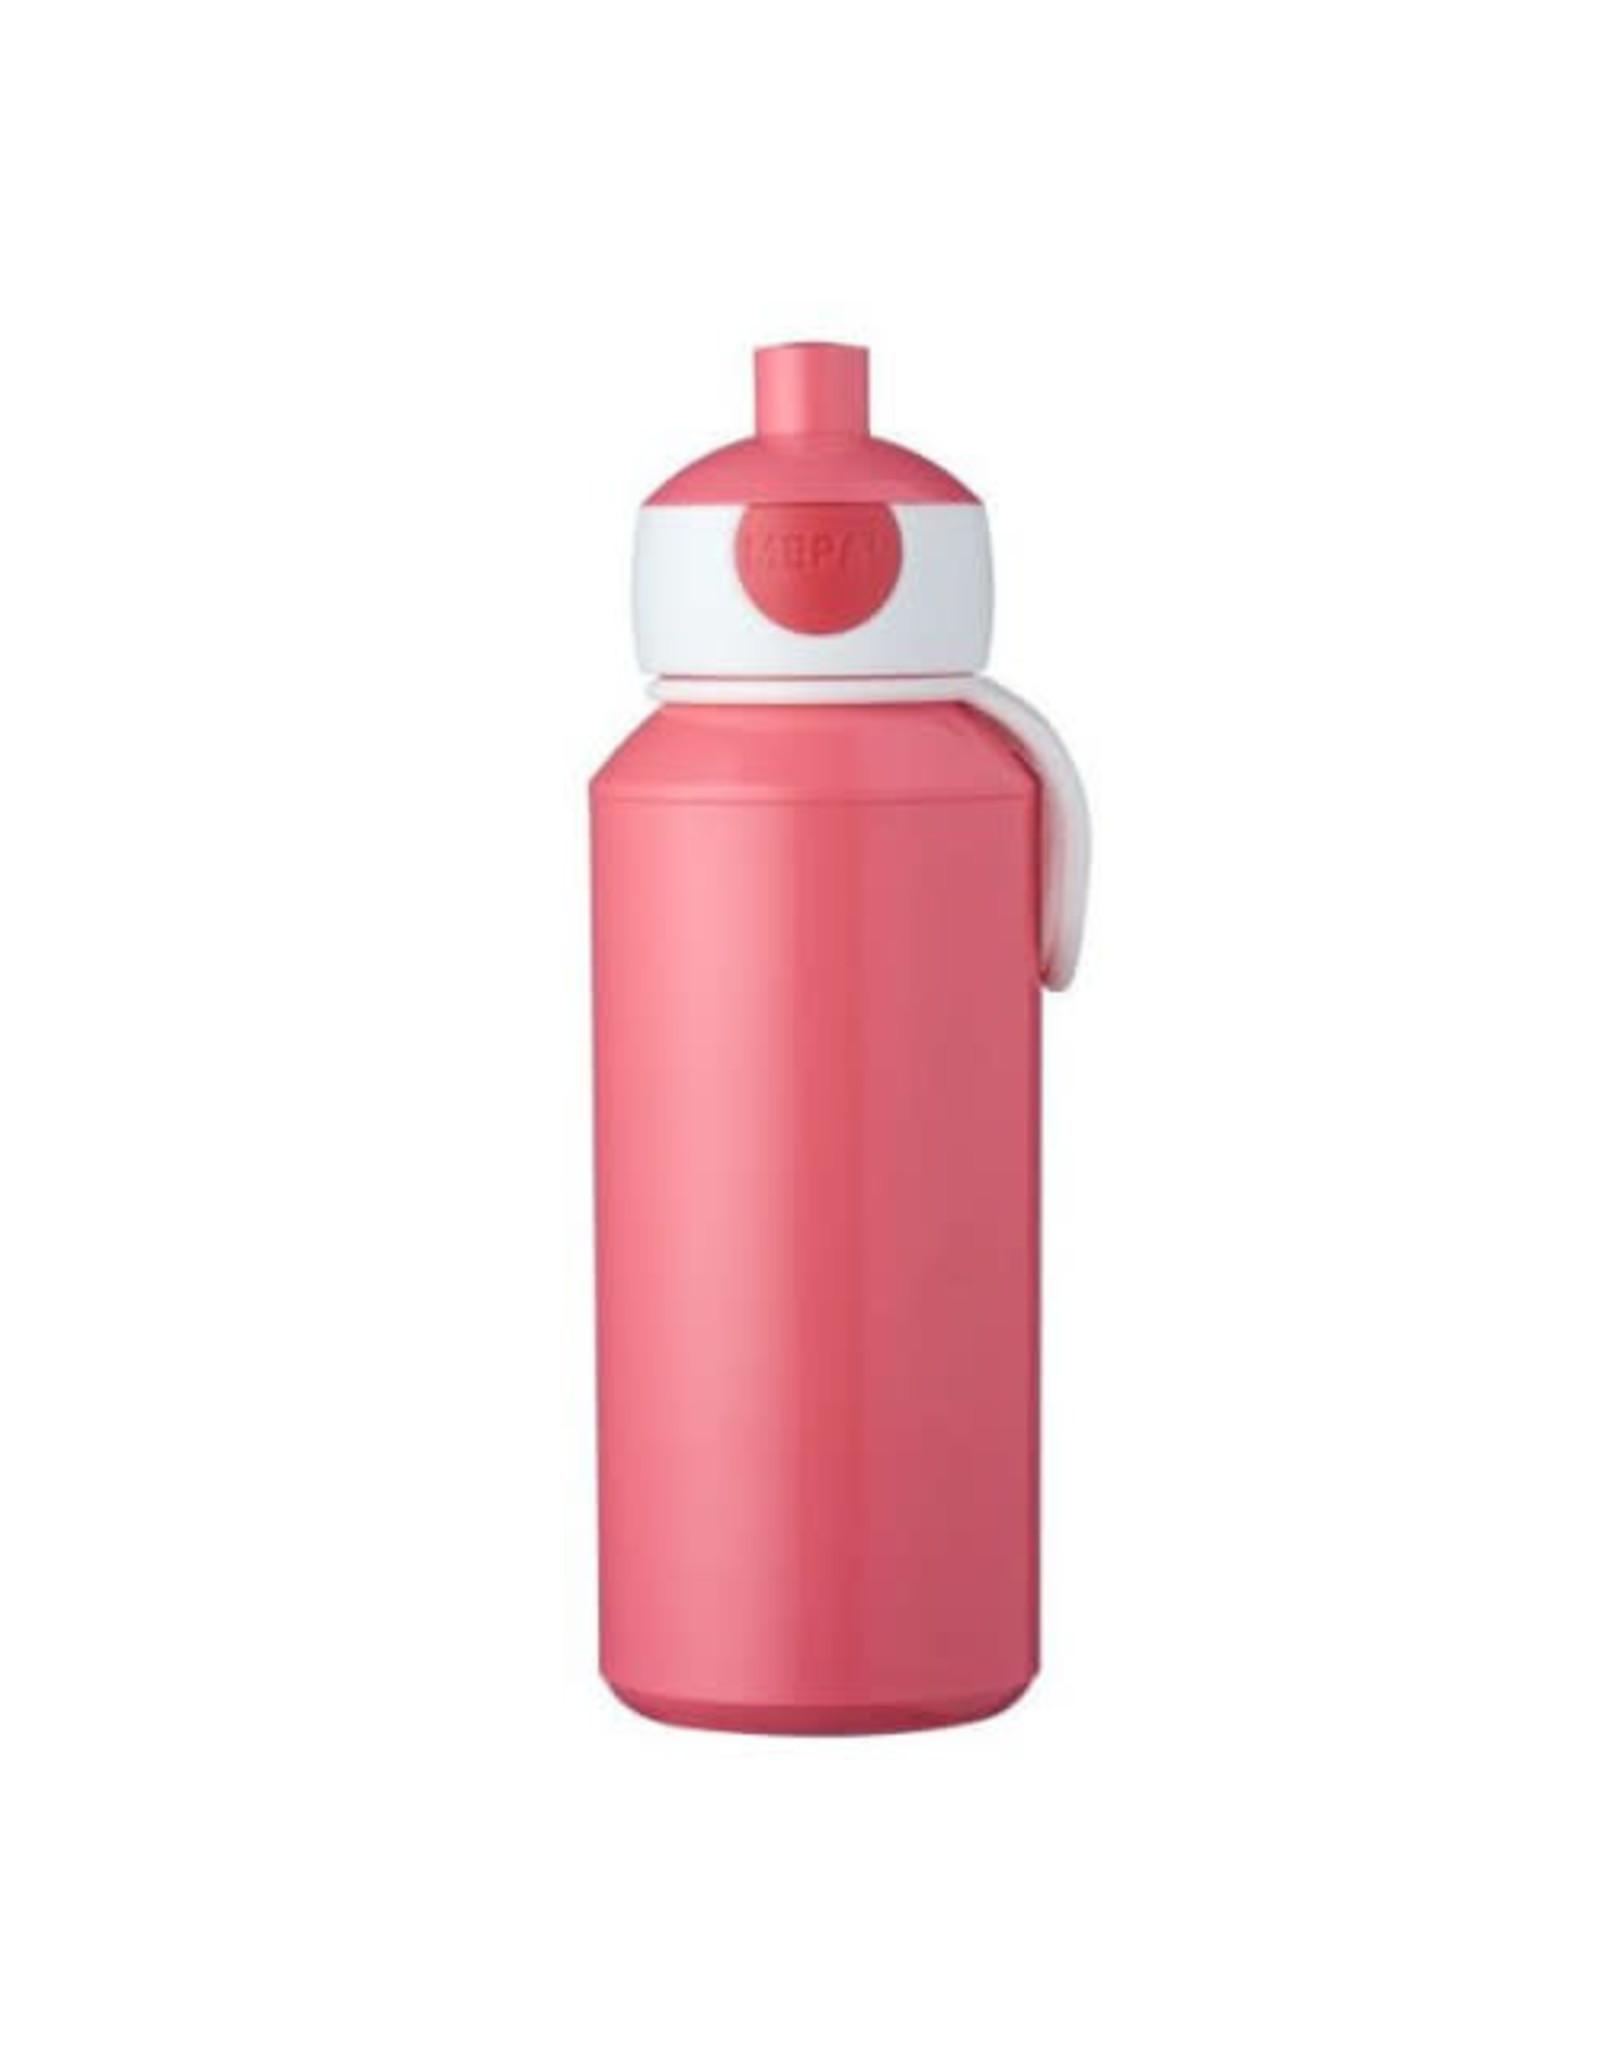 MEPAL Drinkfles pop-up campus 400 ml pink